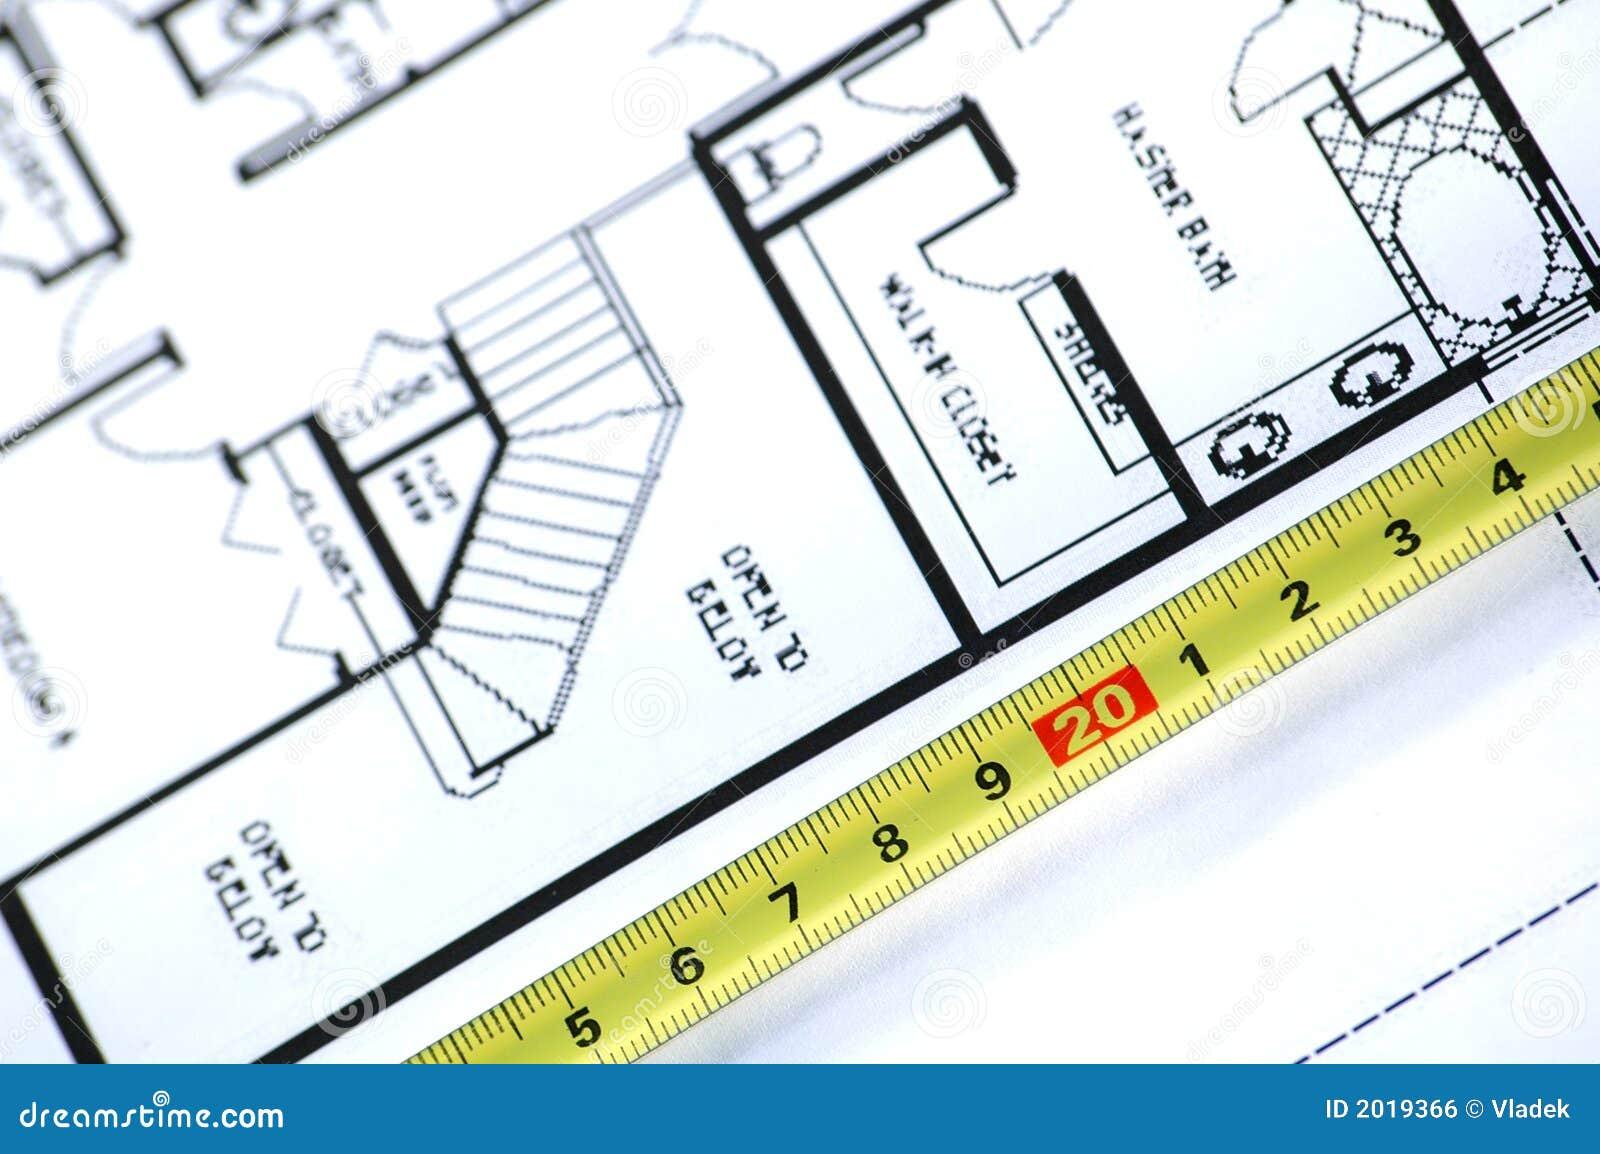 Règle de pliage et plan architectural